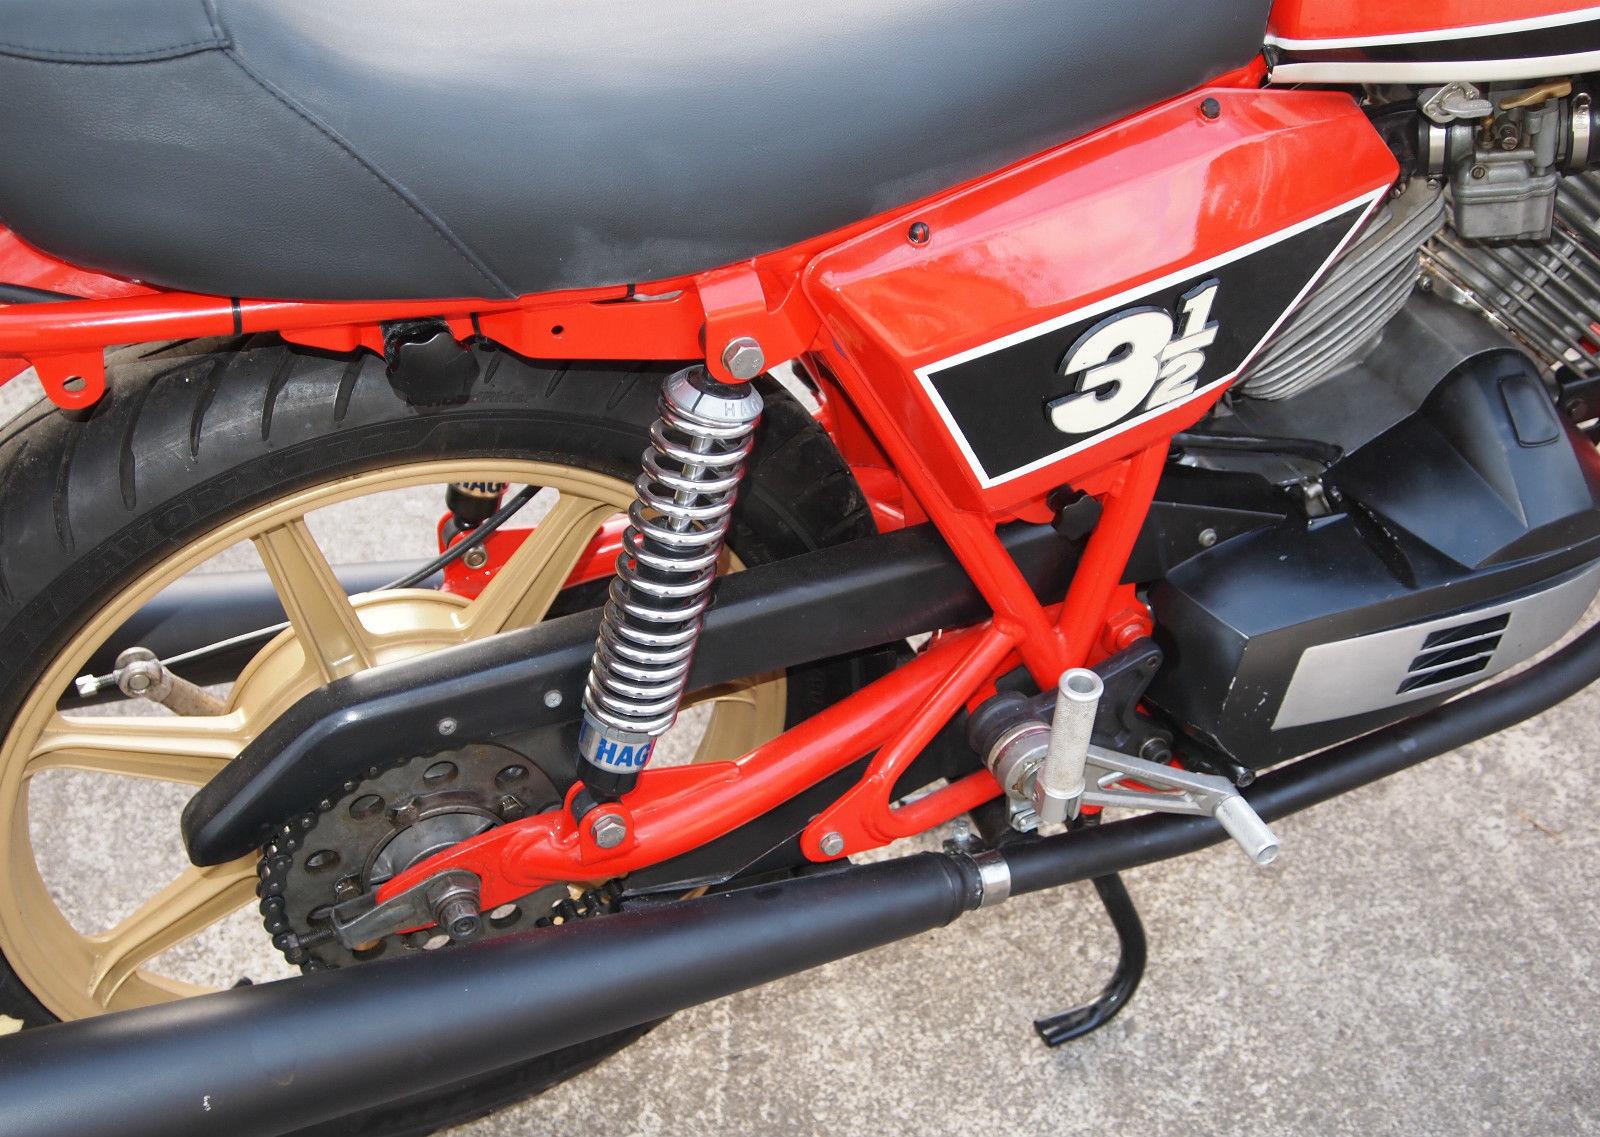 Moto Morini 350 Sport - 1980